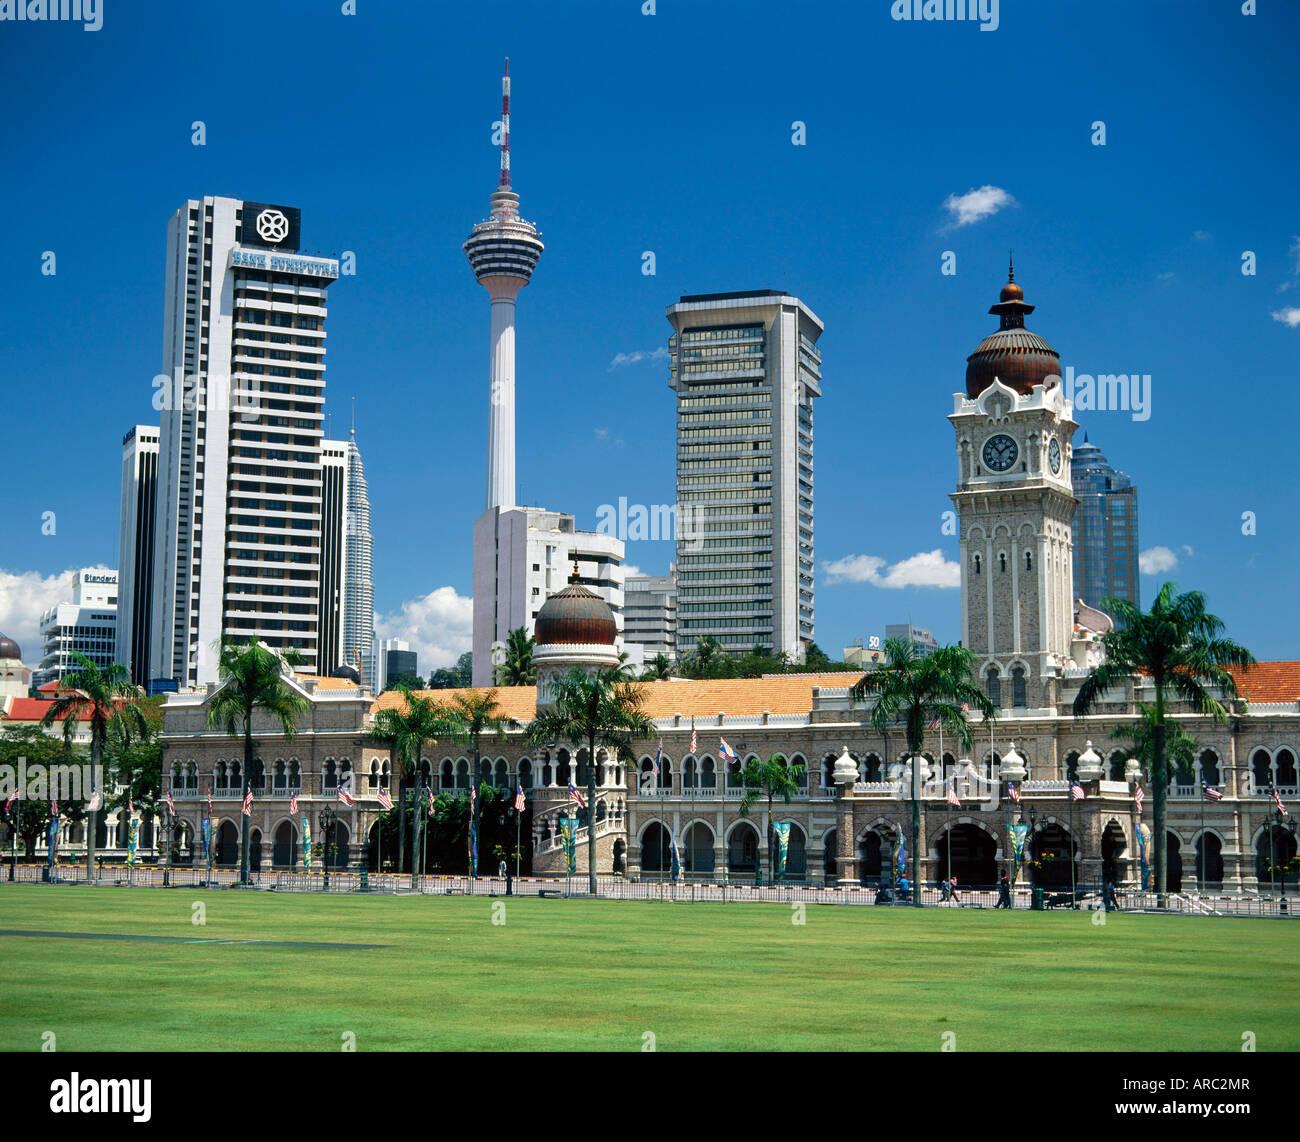 Merdaka Square including the Sultan Abdul Samad Building and the Petronas Towers, Kuala Lumpur, Malaysia, Asia - Stock Image